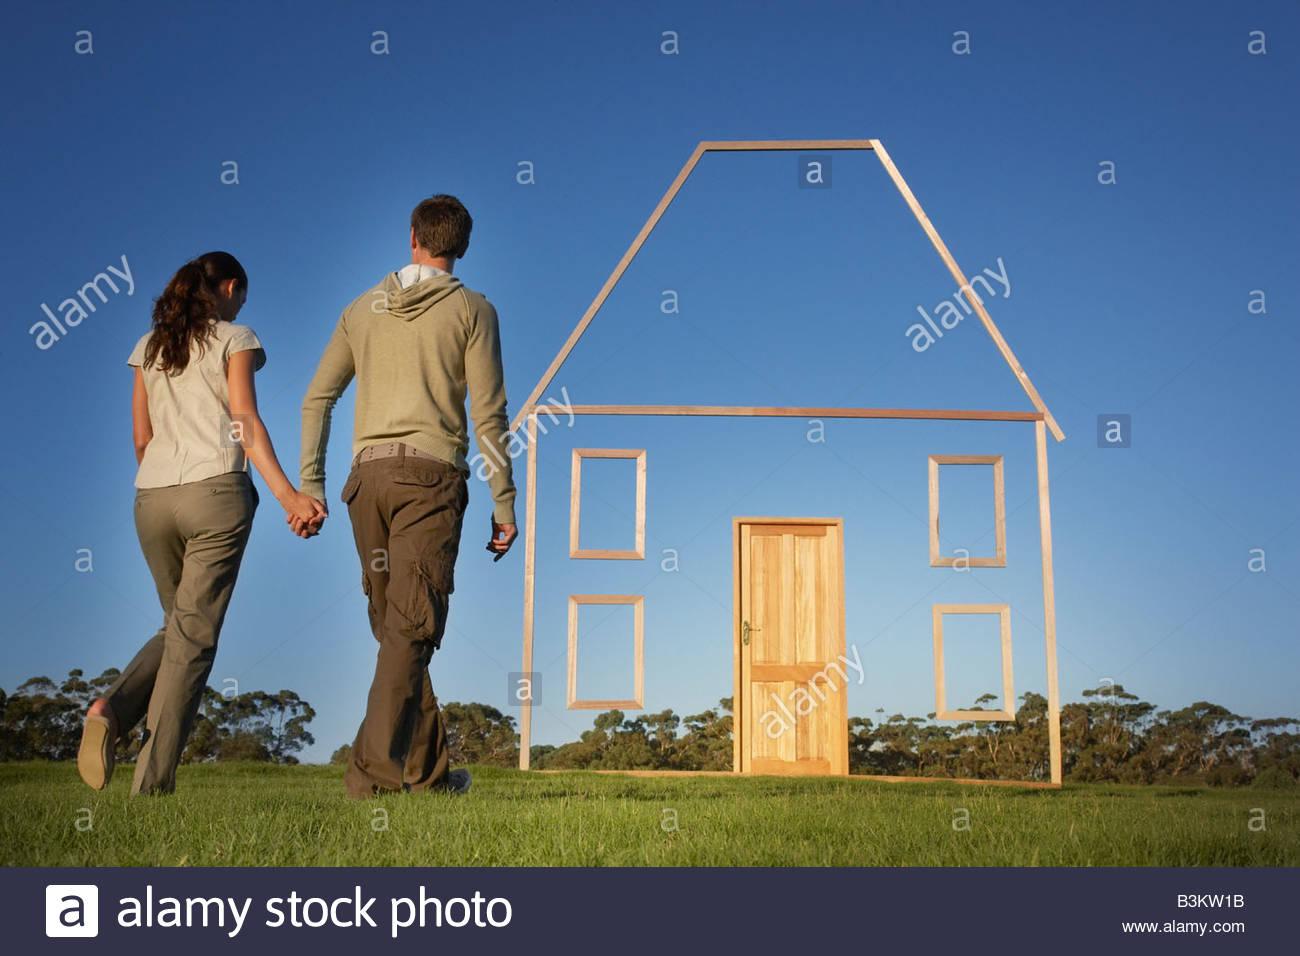 Par caminando hacia casa esquema vertical Imagen De Stock